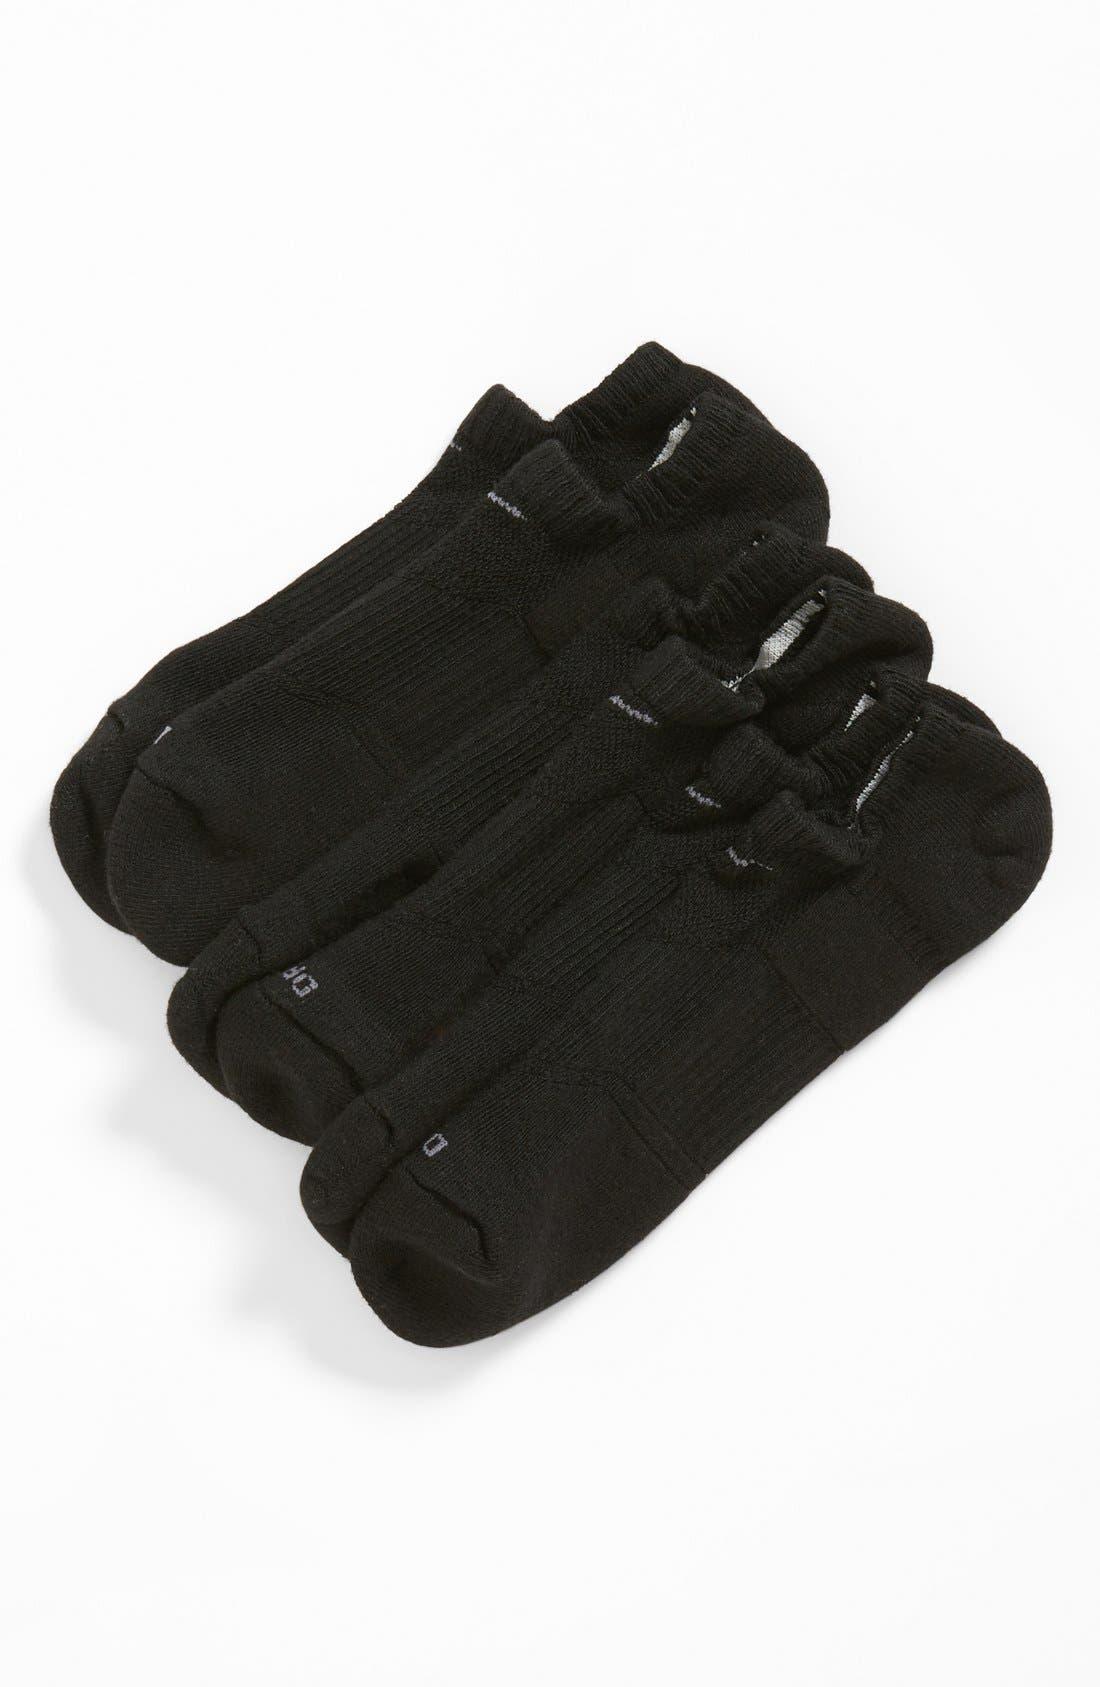 Nike Dri-FIT 3-Pack Cushioned No-Show Socks